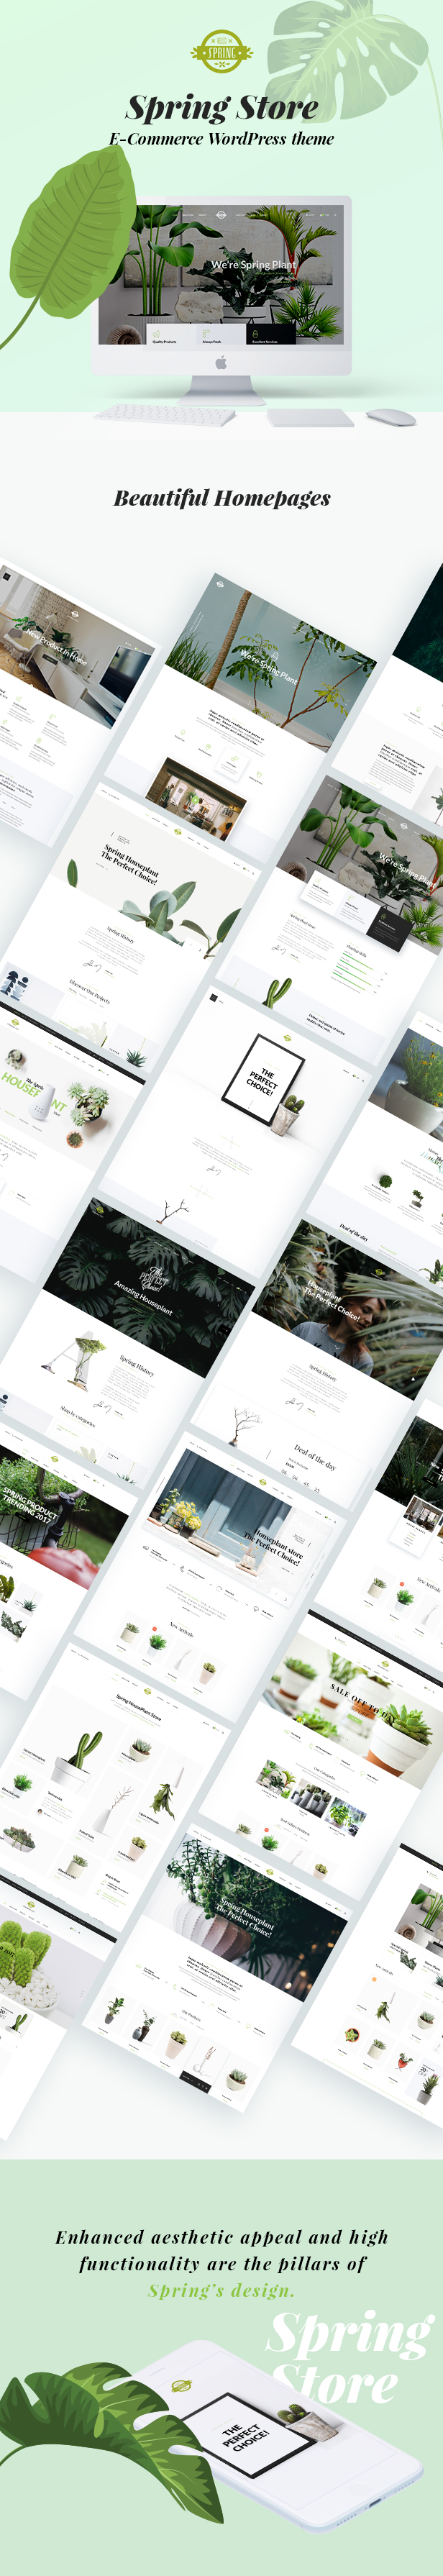 Spring Plants - Gardening and House Plants WordPress Theme - 11